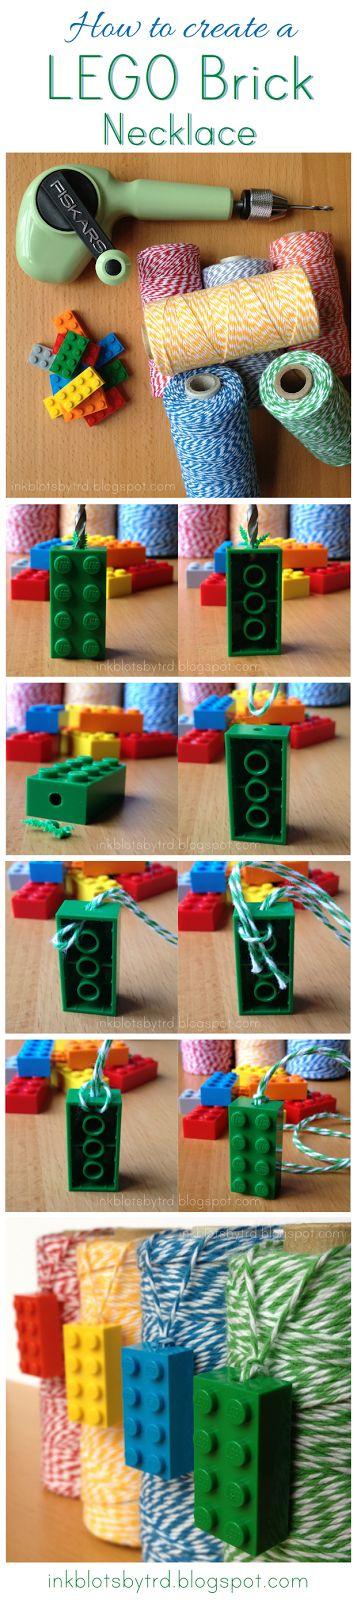 LEGO-Brick-Twine-Necklace-Tutorial.png 357×1,600 pixels